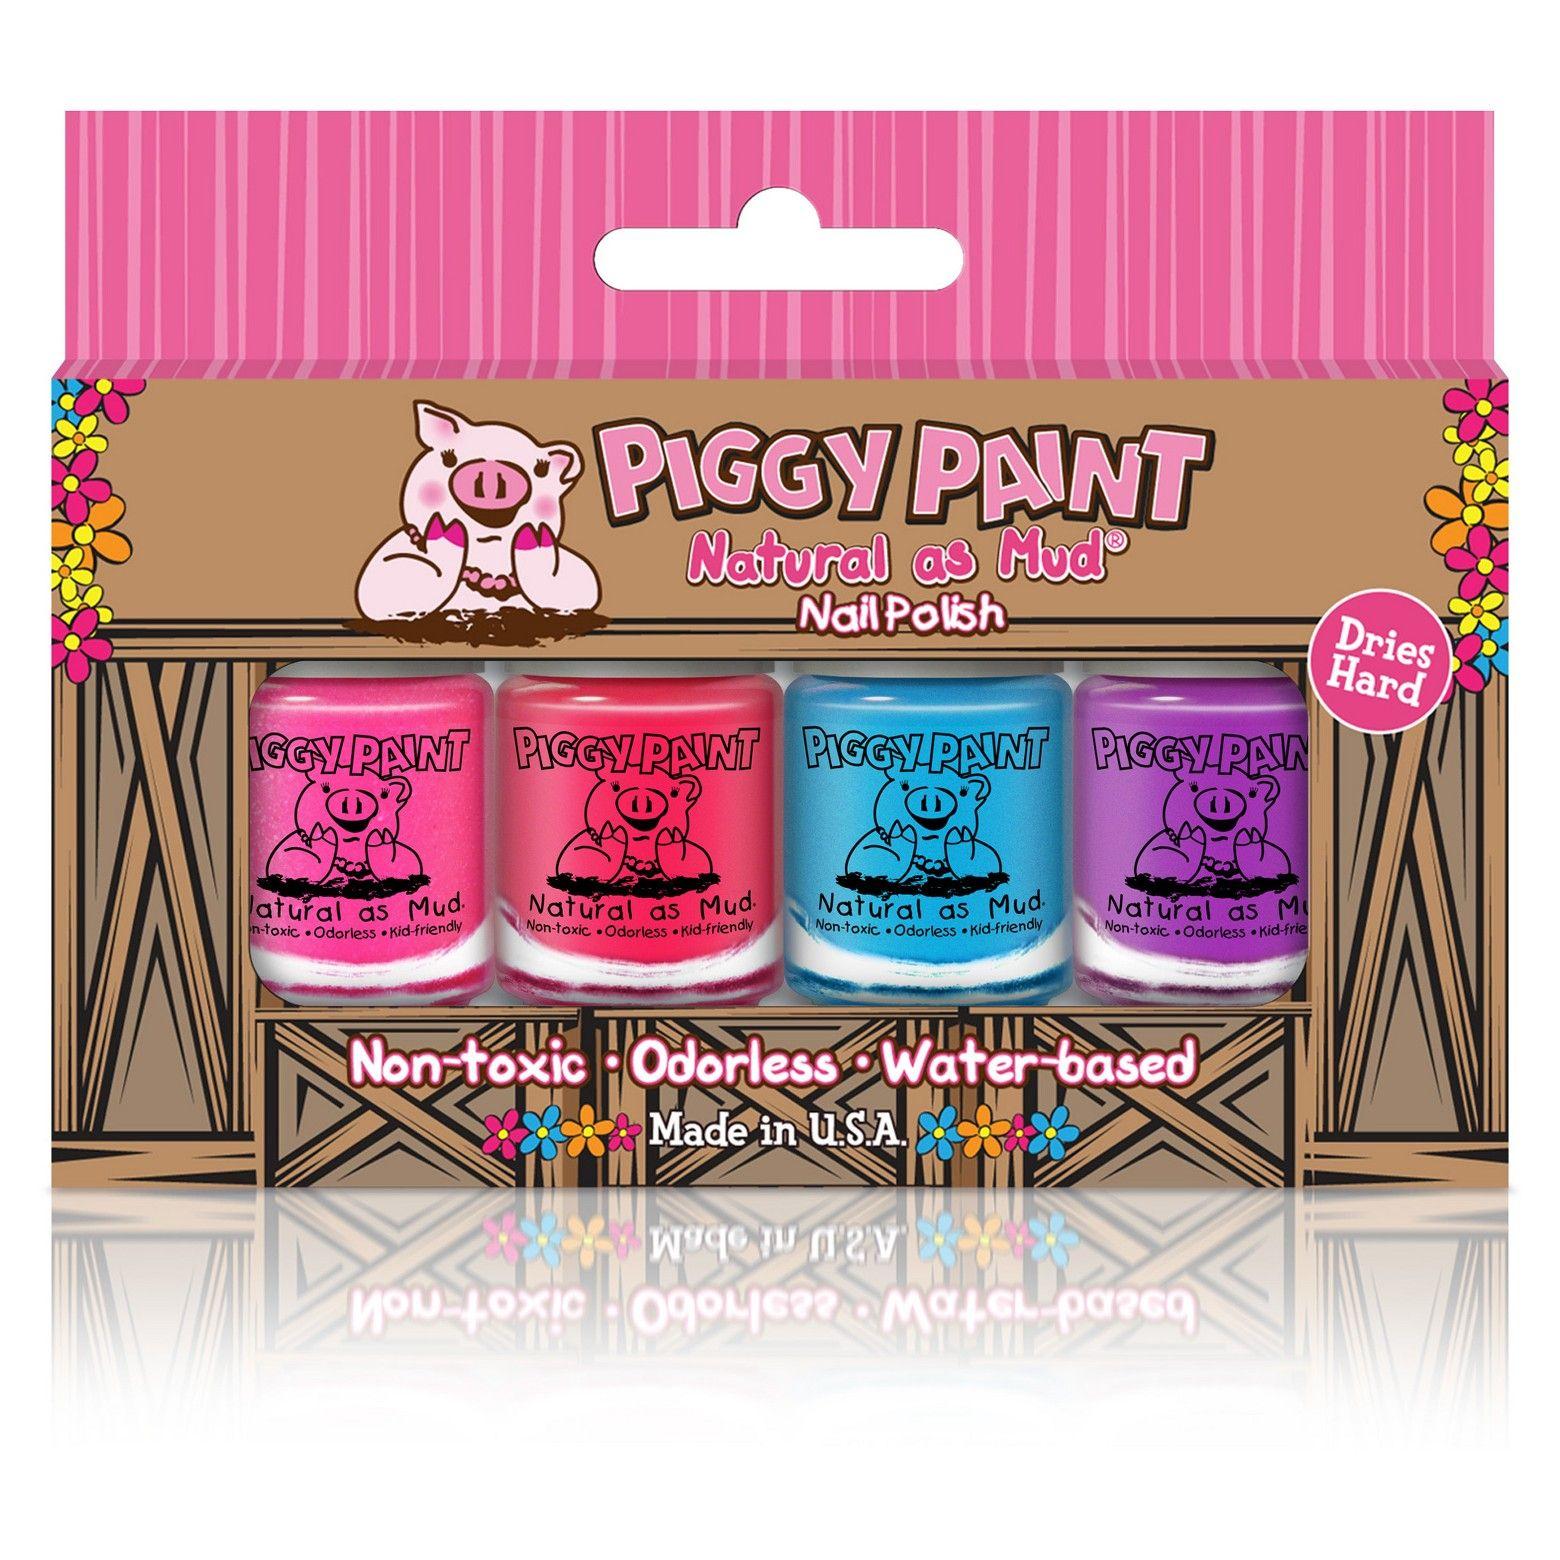 Piggy Paint Nail Polish Set 0.48 oz, | Nail polish sets